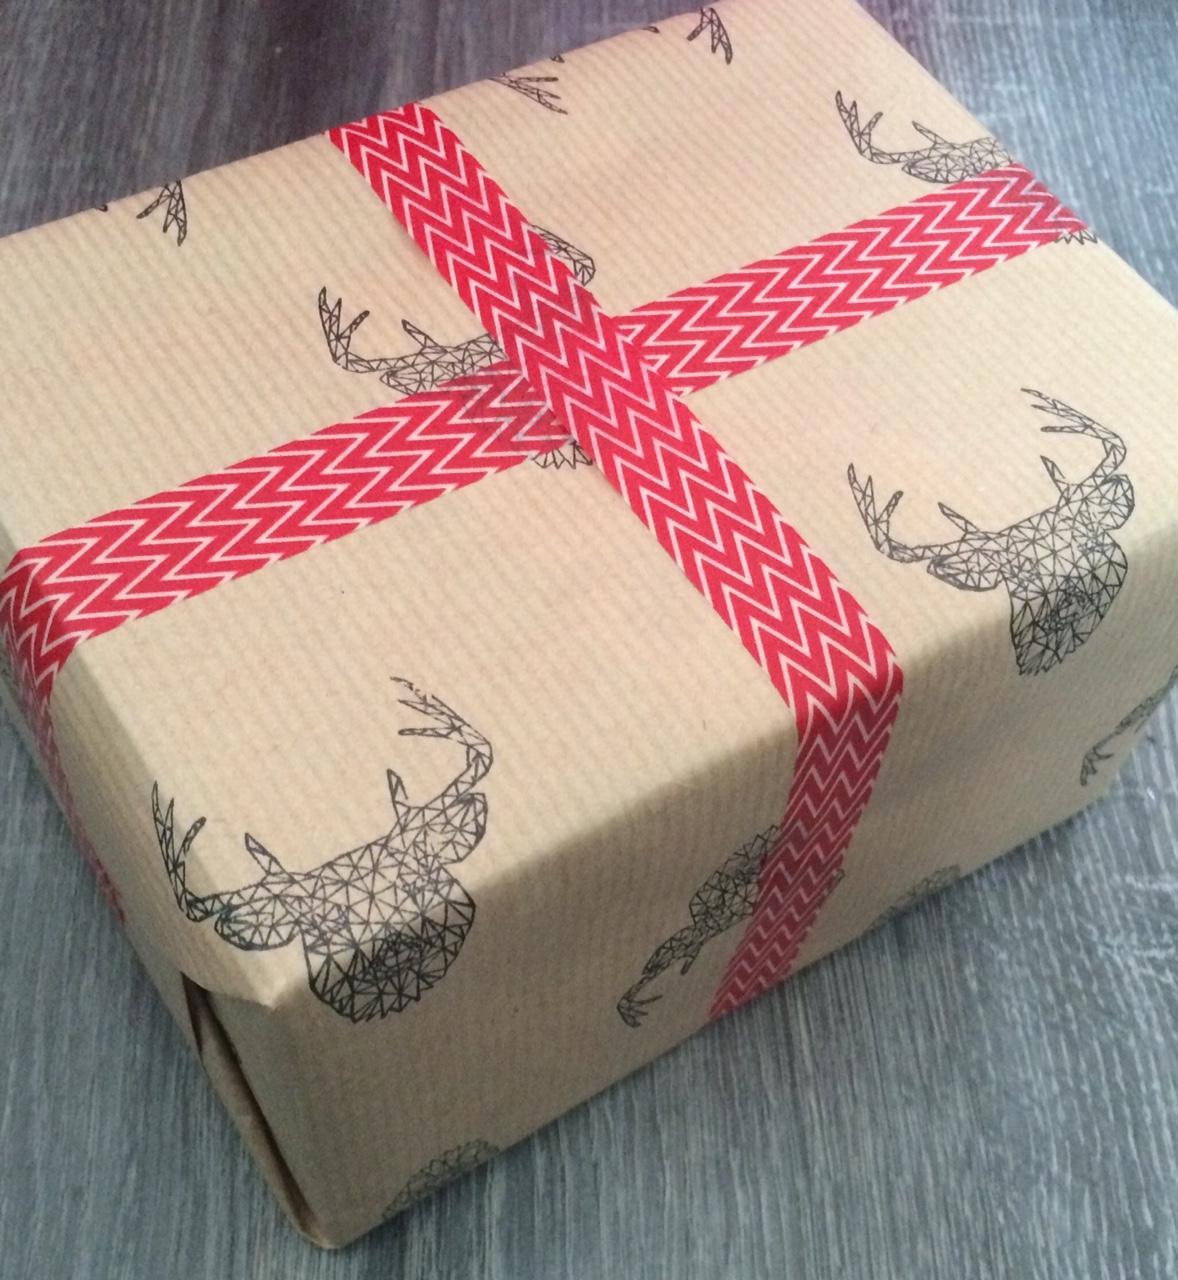 le blog de minimlescrap id e emballage cadeau dt lovely tape flamingo design studio. Black Bedroom Furniture Sets. Home Design Ideas